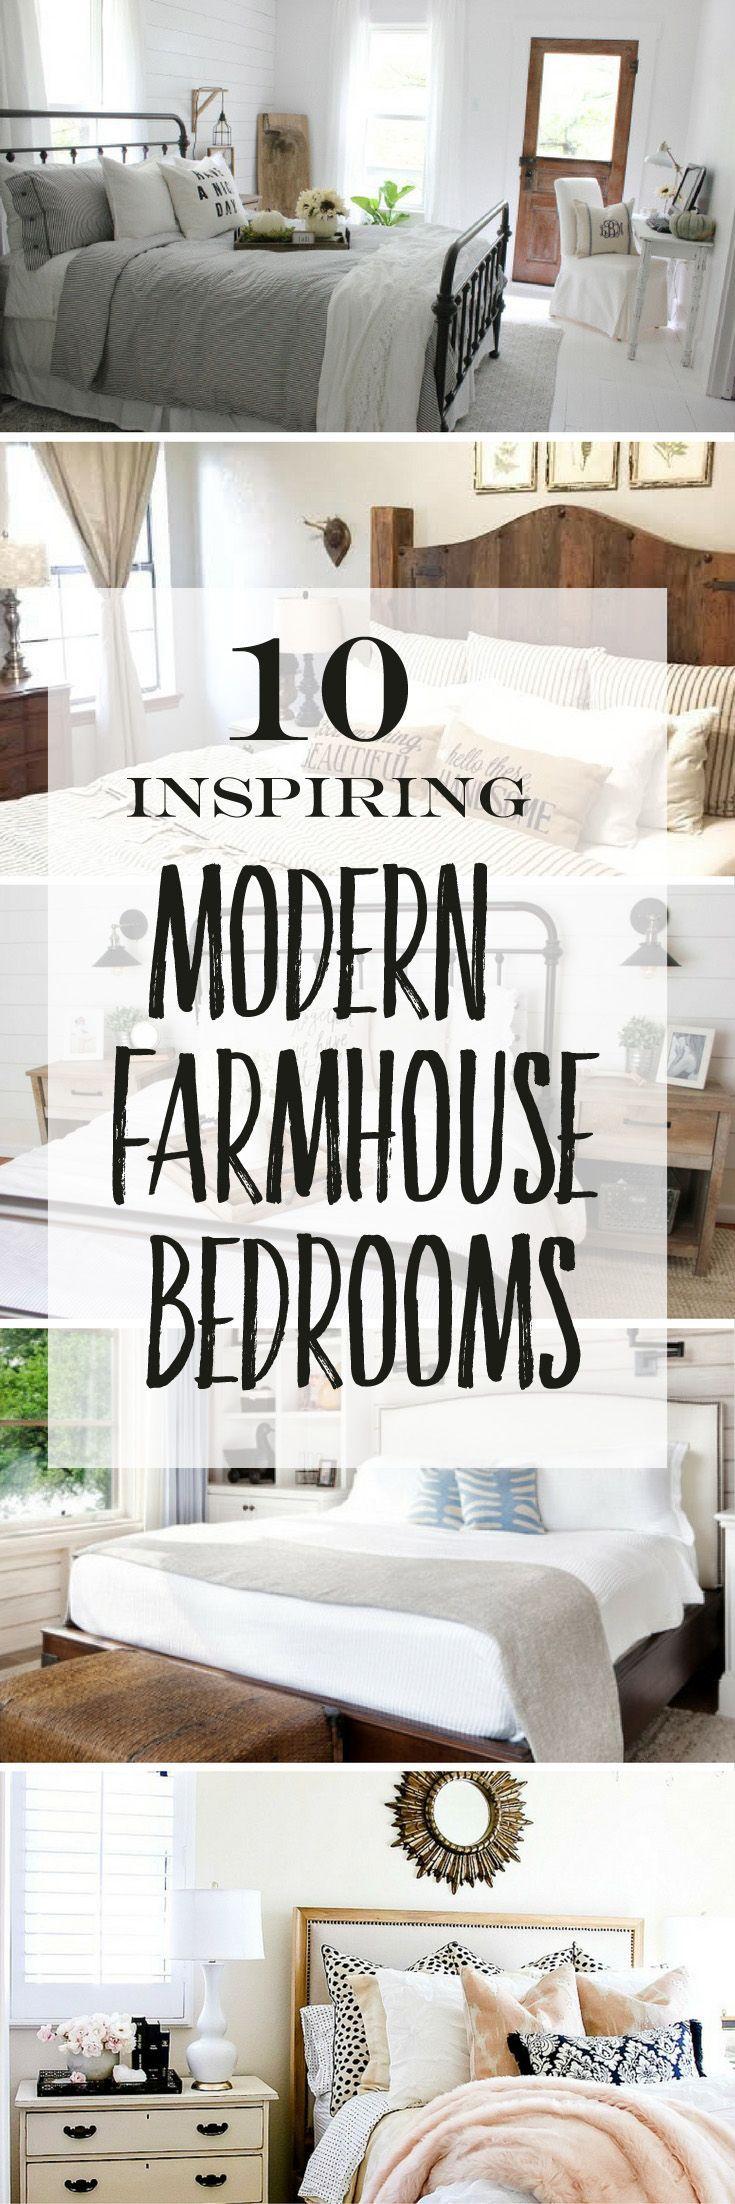 best 25+ modern farmhouse bedroom ideas on pinterest | farmhouse